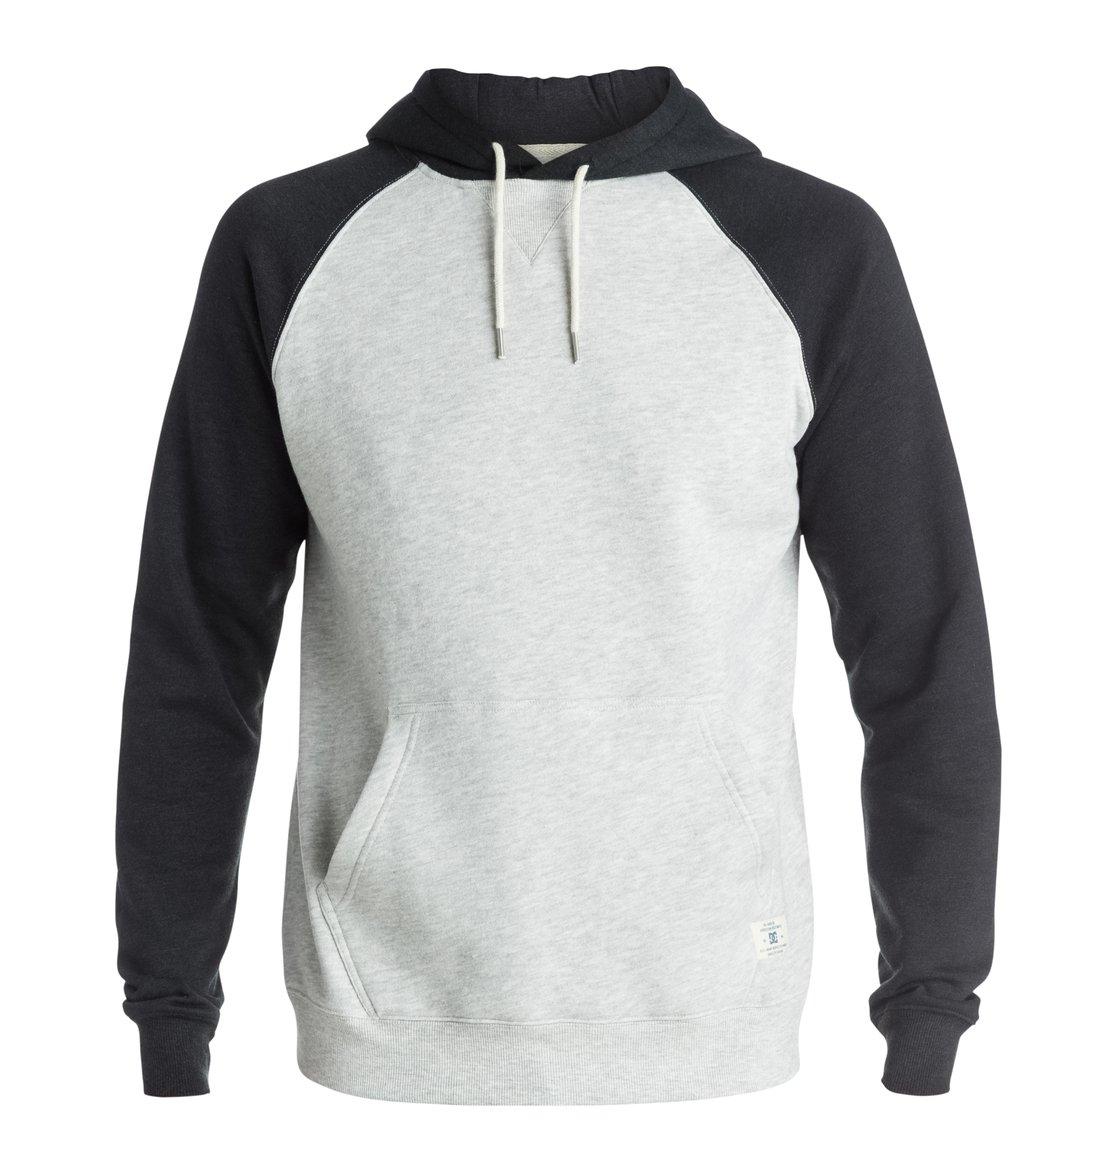 Dcshoes Мужской пуловер с капюшоном Rebel Raglan Rebel Raglan Pull Over Hoodie